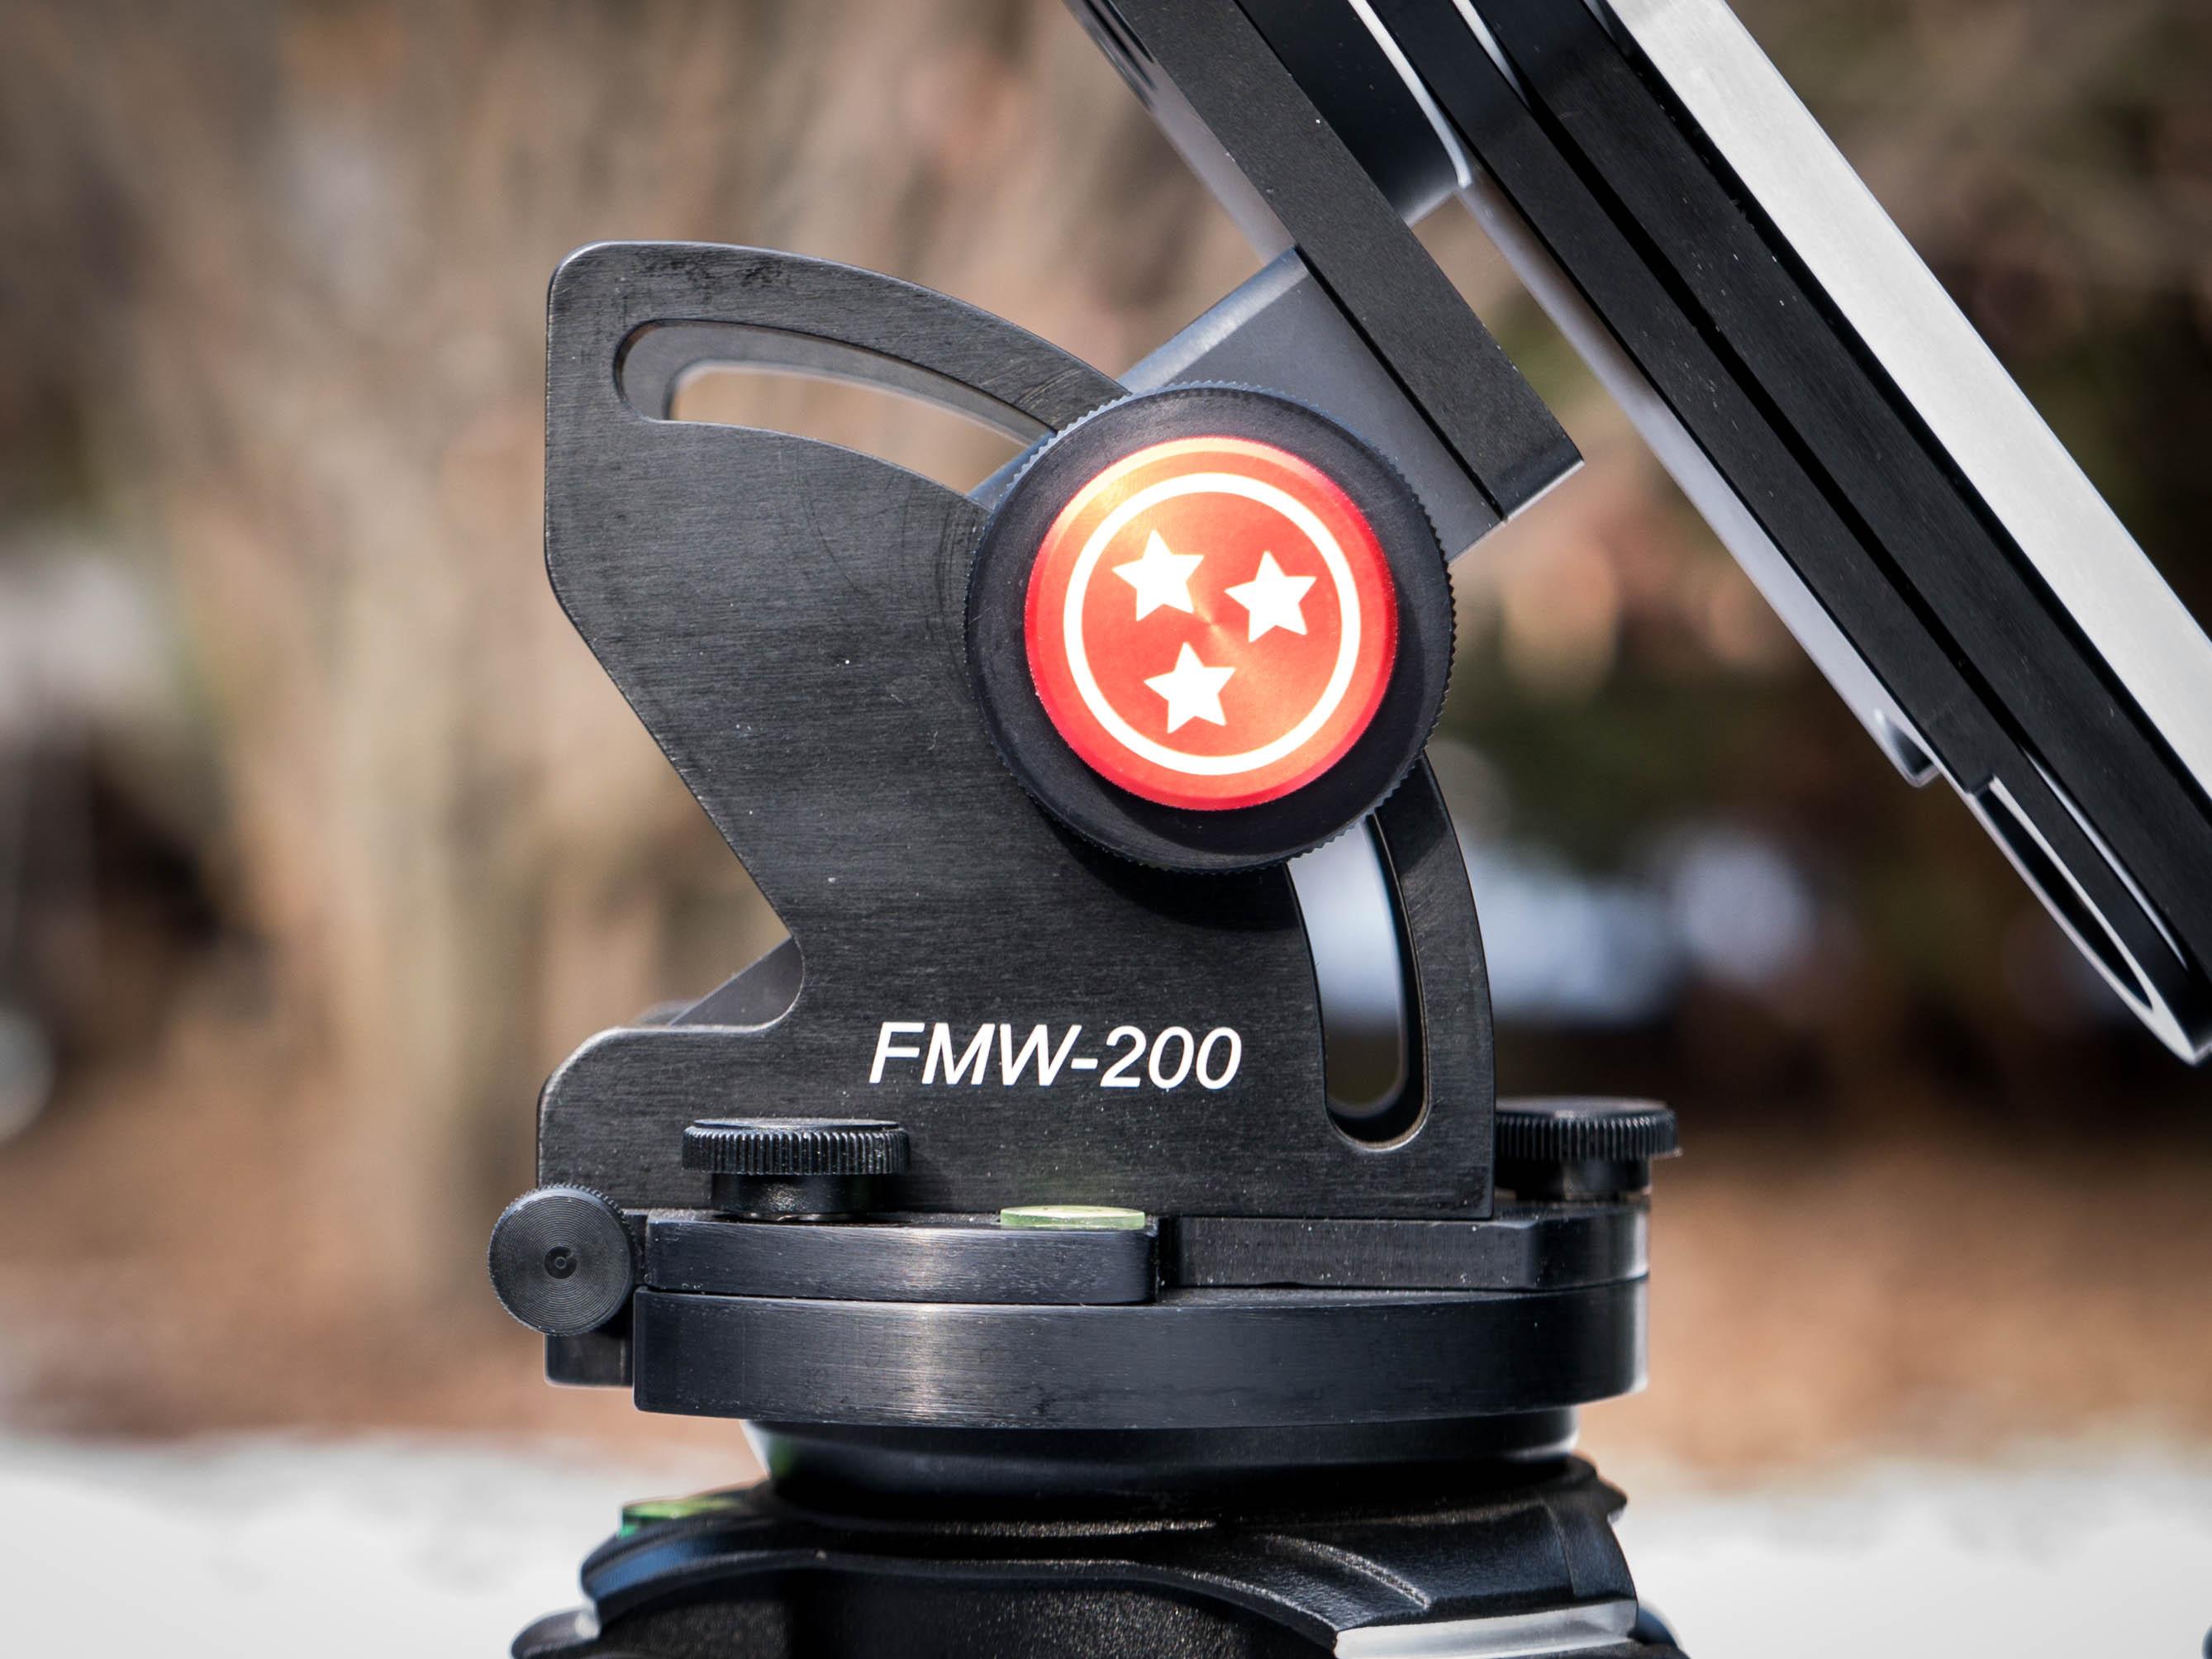 fmw-200 edge